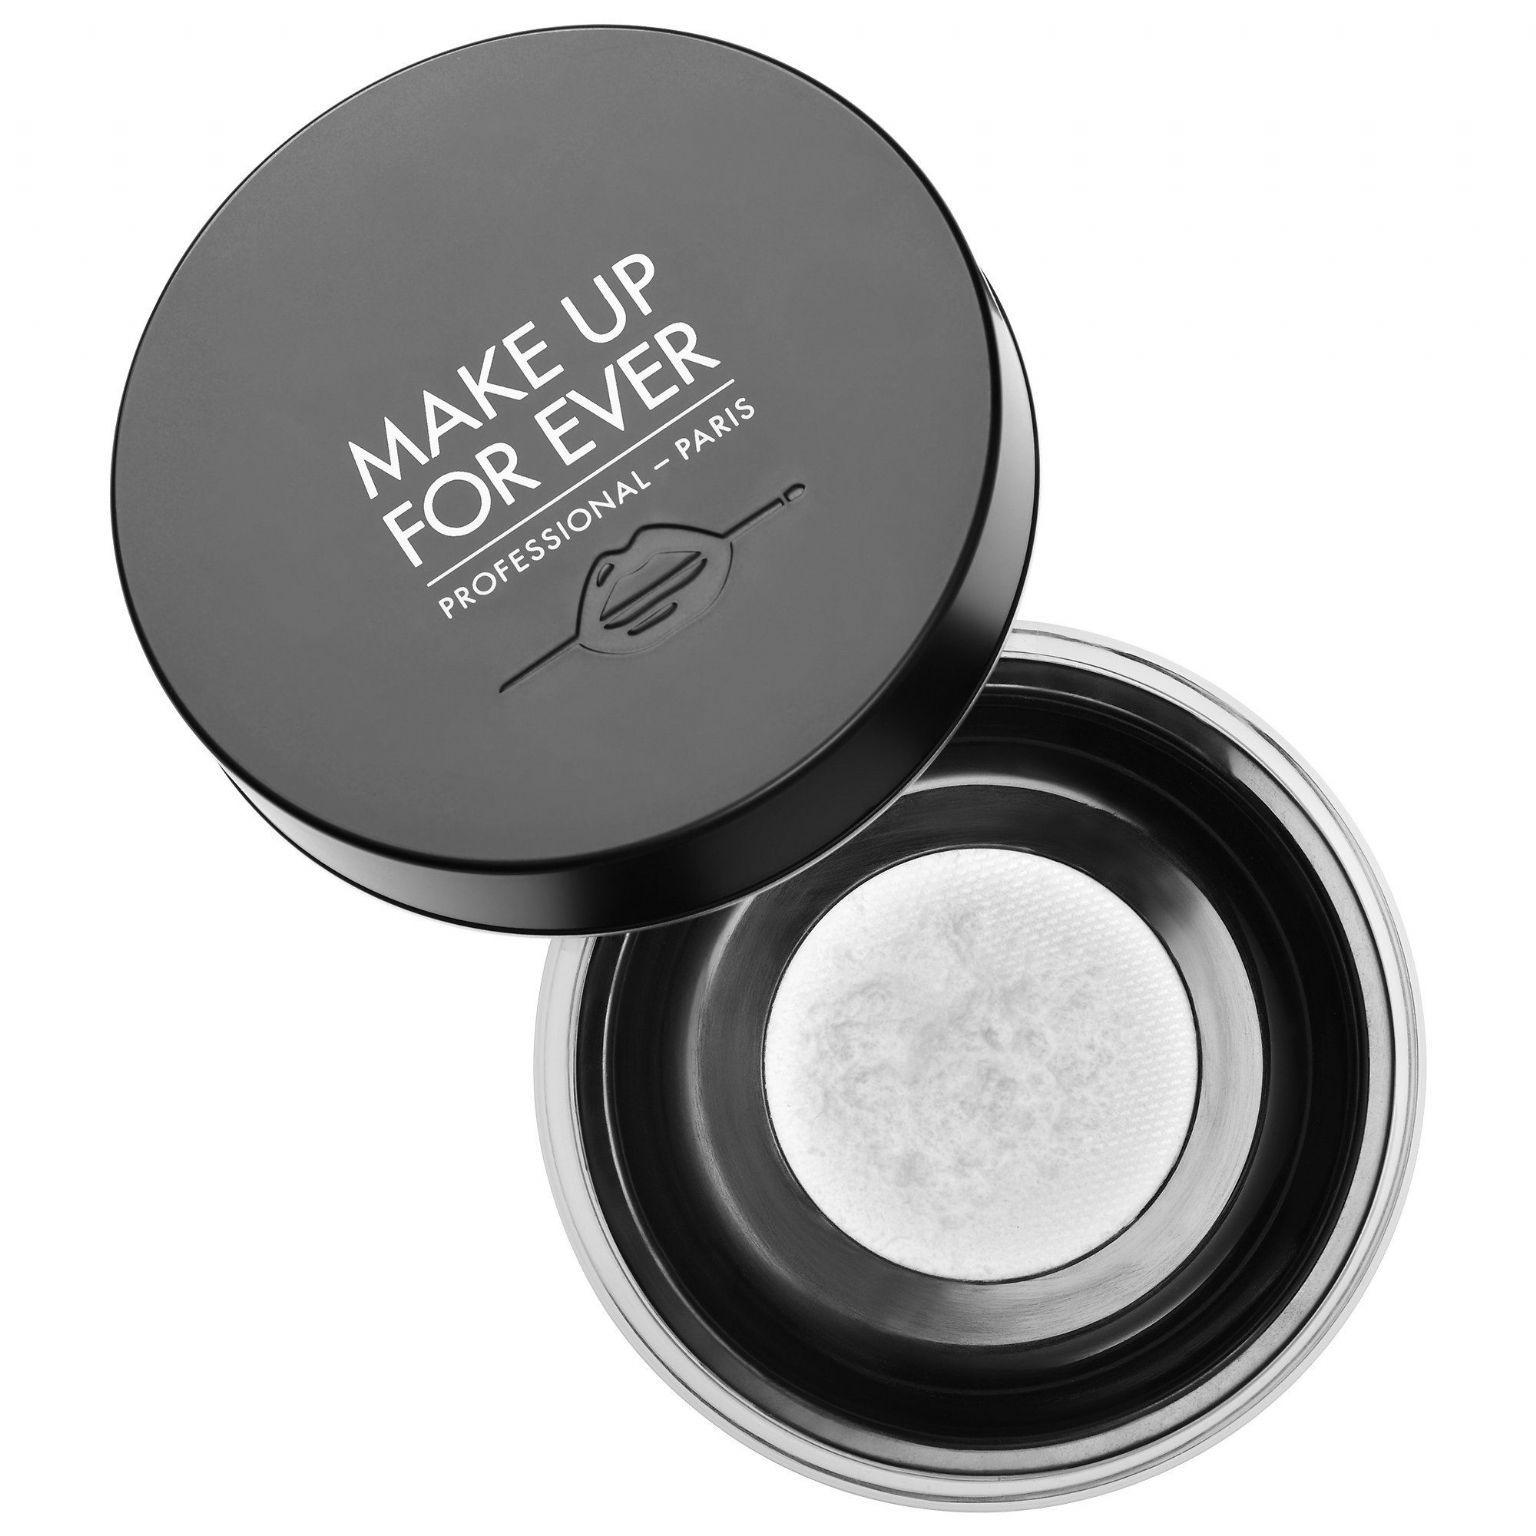 Ultra HD Loose Powder Microfinishing Powder